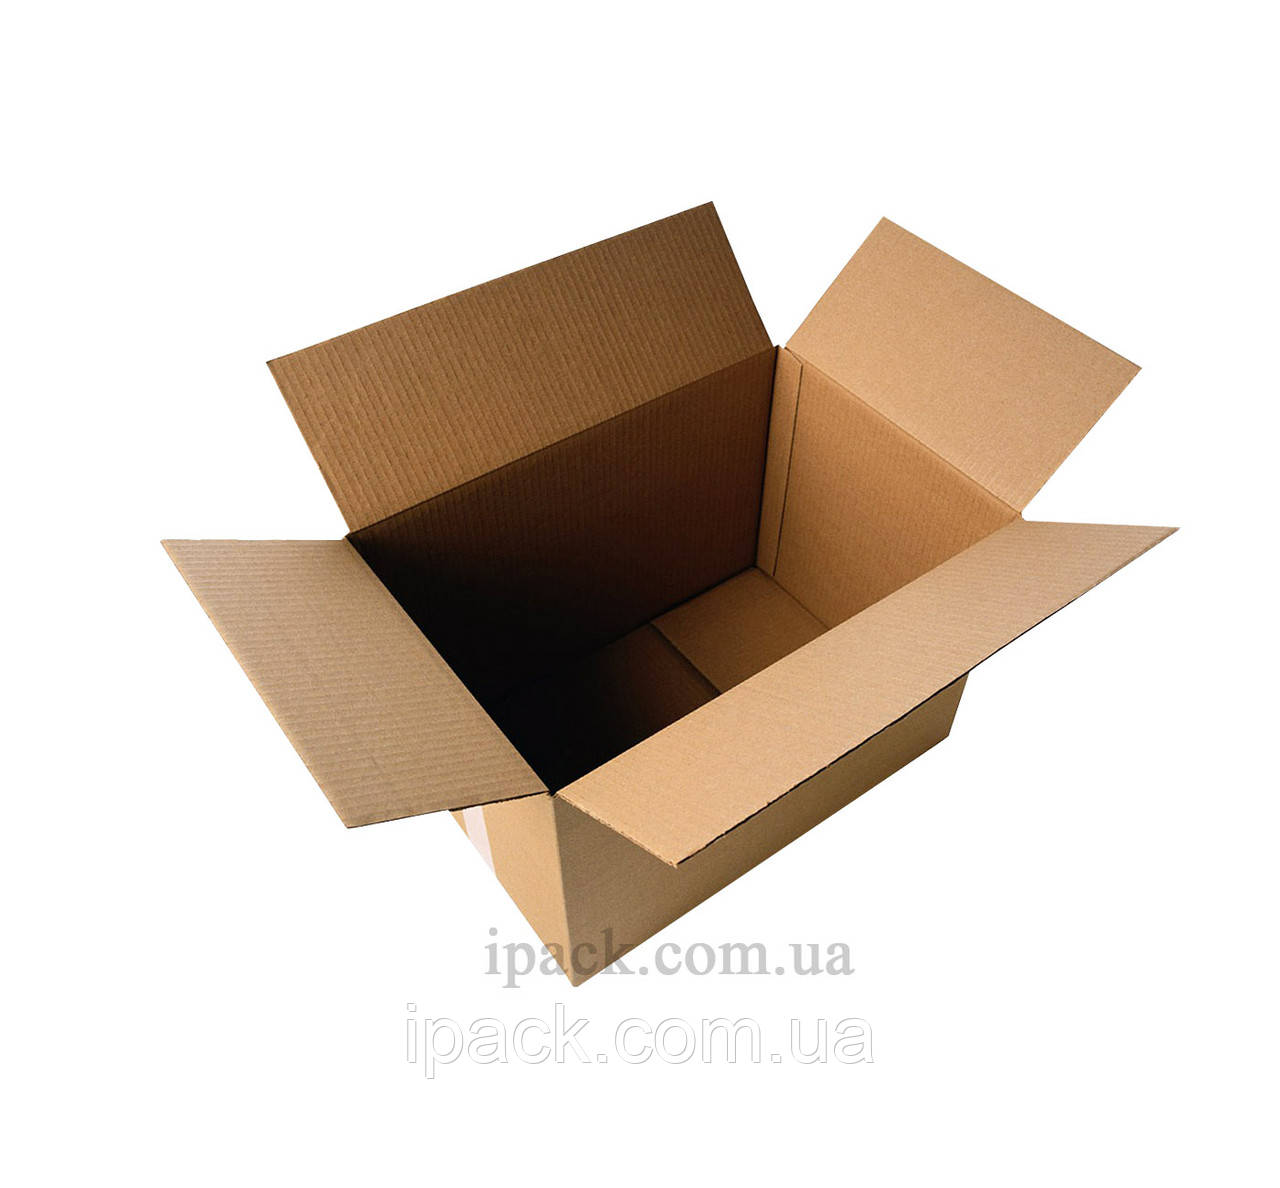 Гофроящик 330*165*225 мм, бурый, четырехклапанный картонный короб